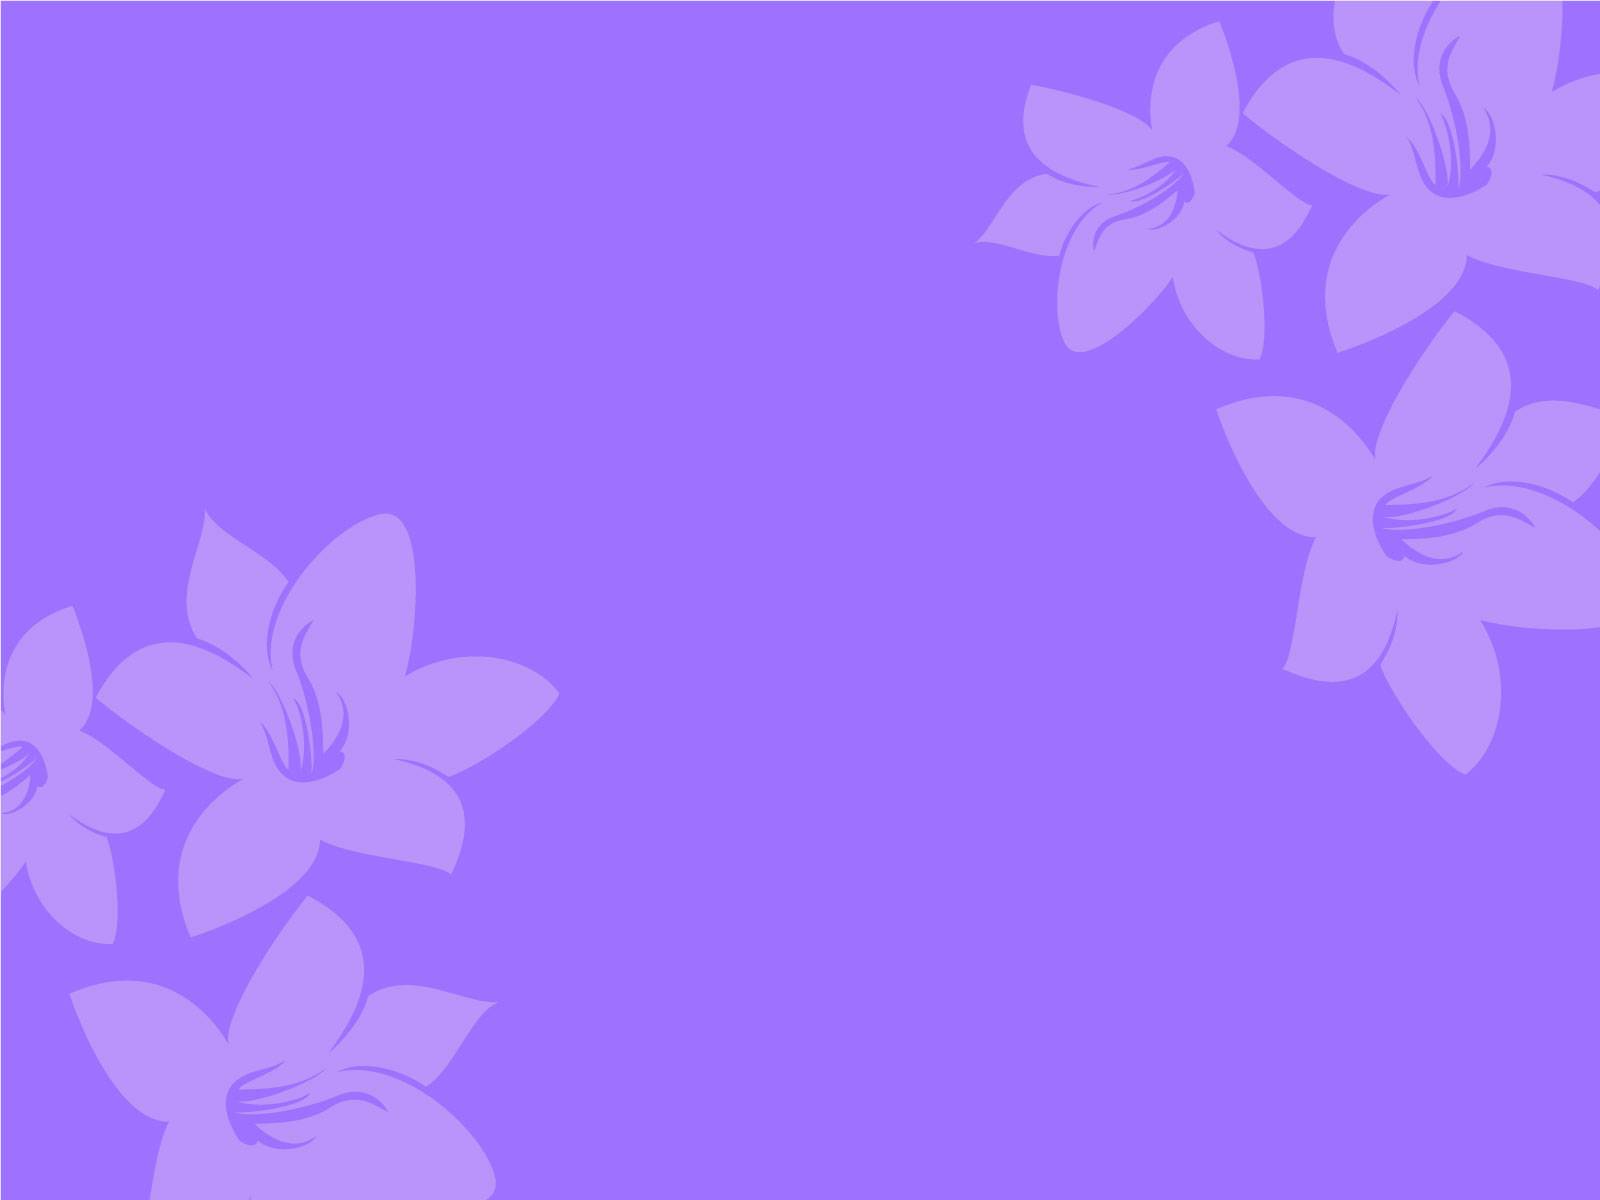 hd backgrounds purple - photo #38